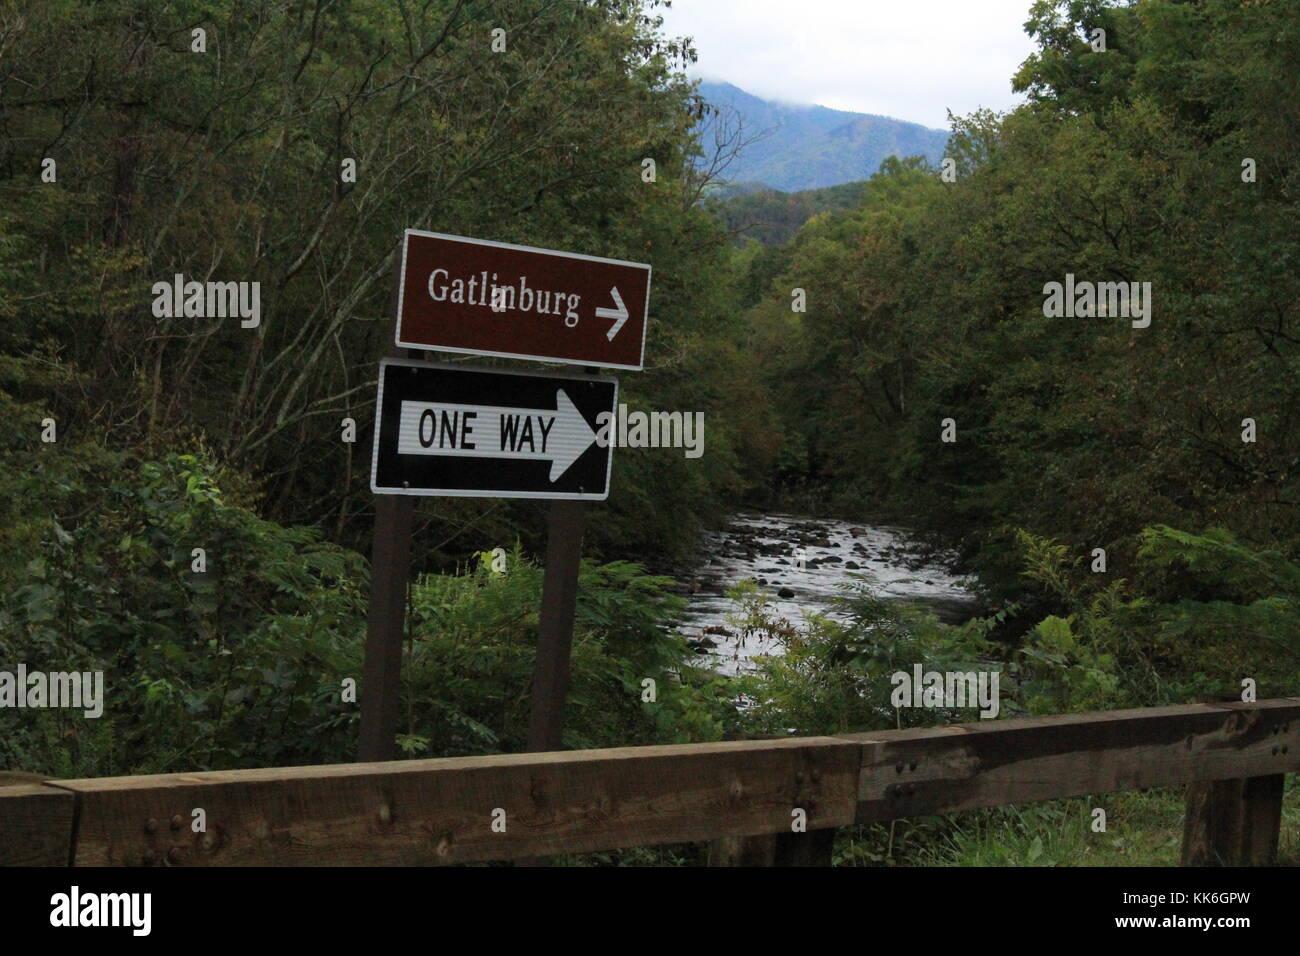 Gatlinburg Tennessee street sign. - Stock Image